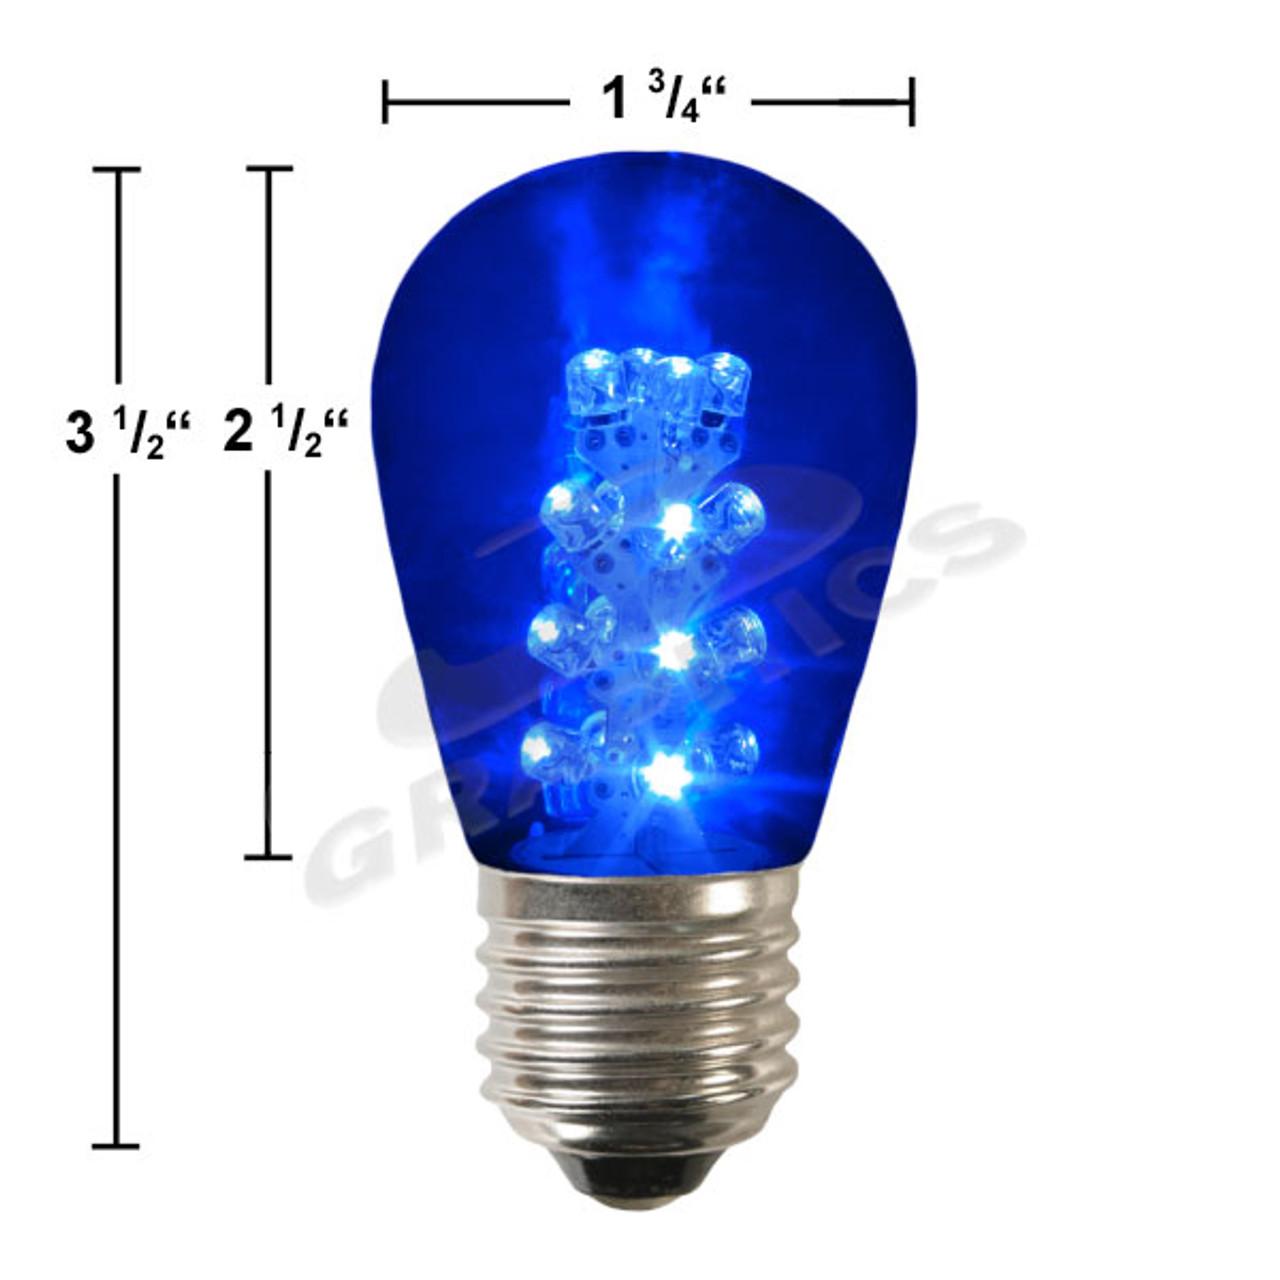 50 x Pre wired 9v 3mm UV Purple LEDs Prewired 9 volt DC LED Light RC Prop 8v 7v